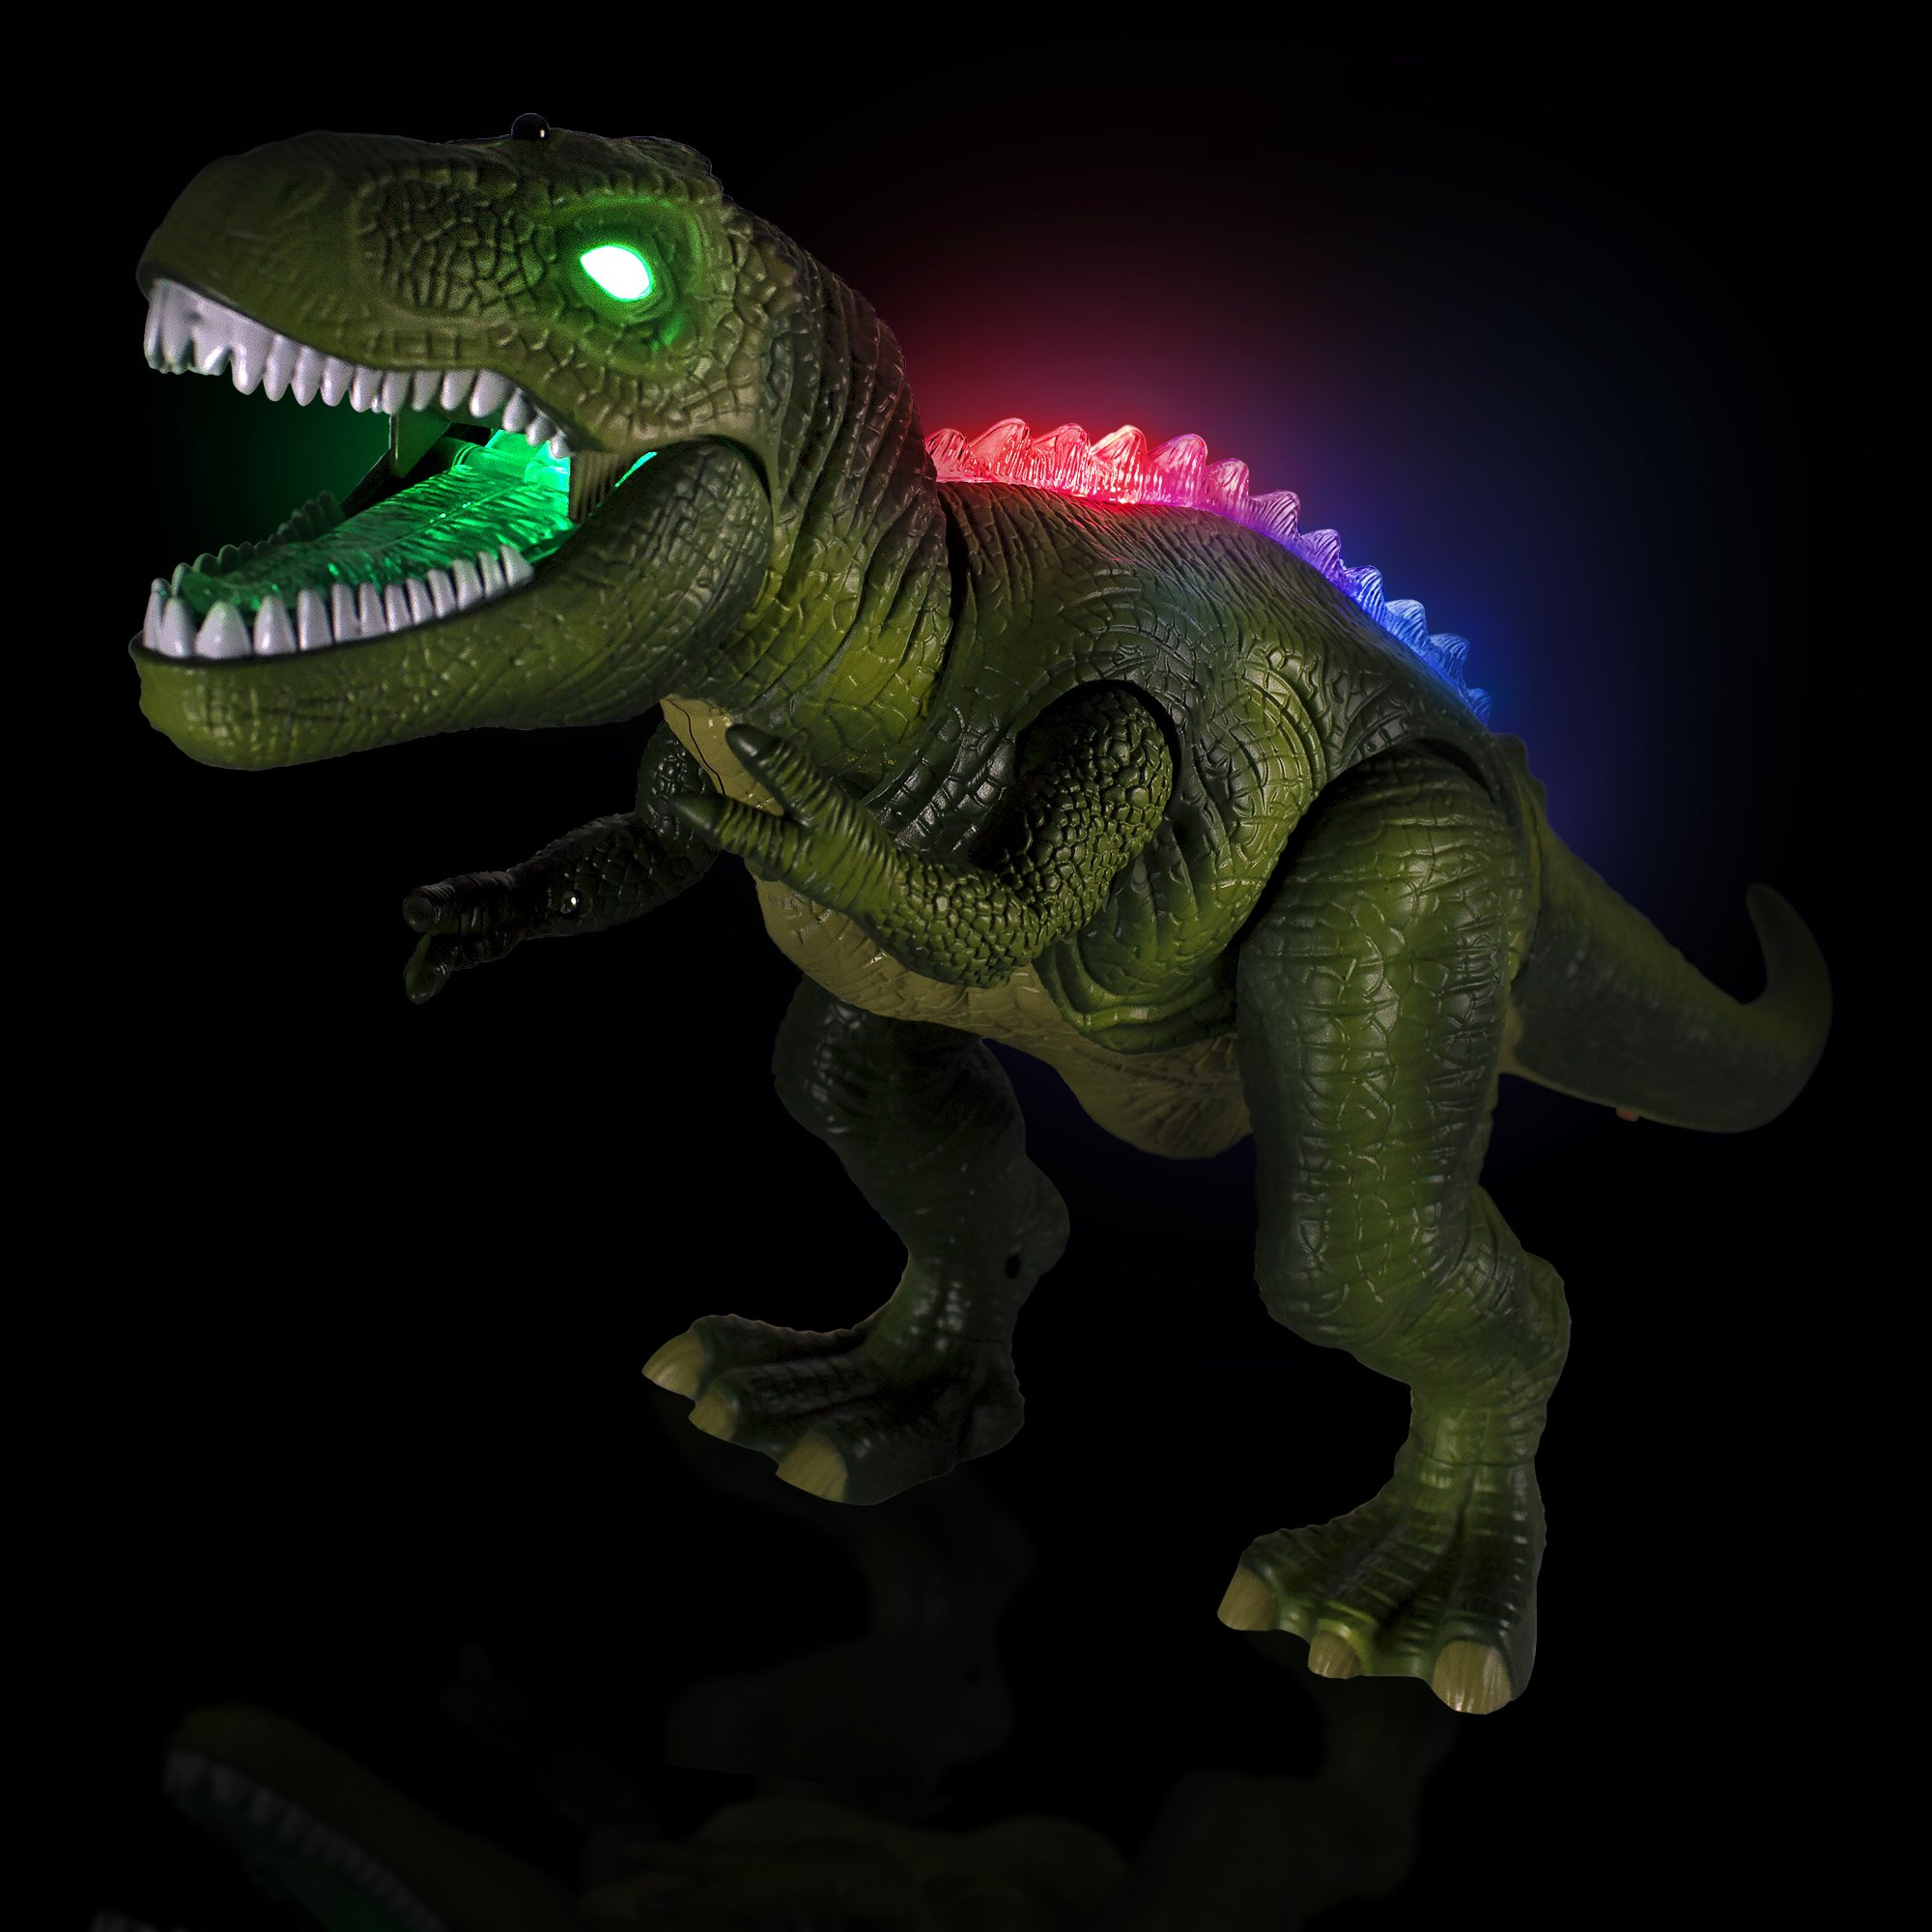 Windy City Novelties Led Light-Up Walking & Roaring T-Rex Dinosaur Toys for Boys & Girls (T-Rex with Remote) by Windy City Novelties (Image #2)